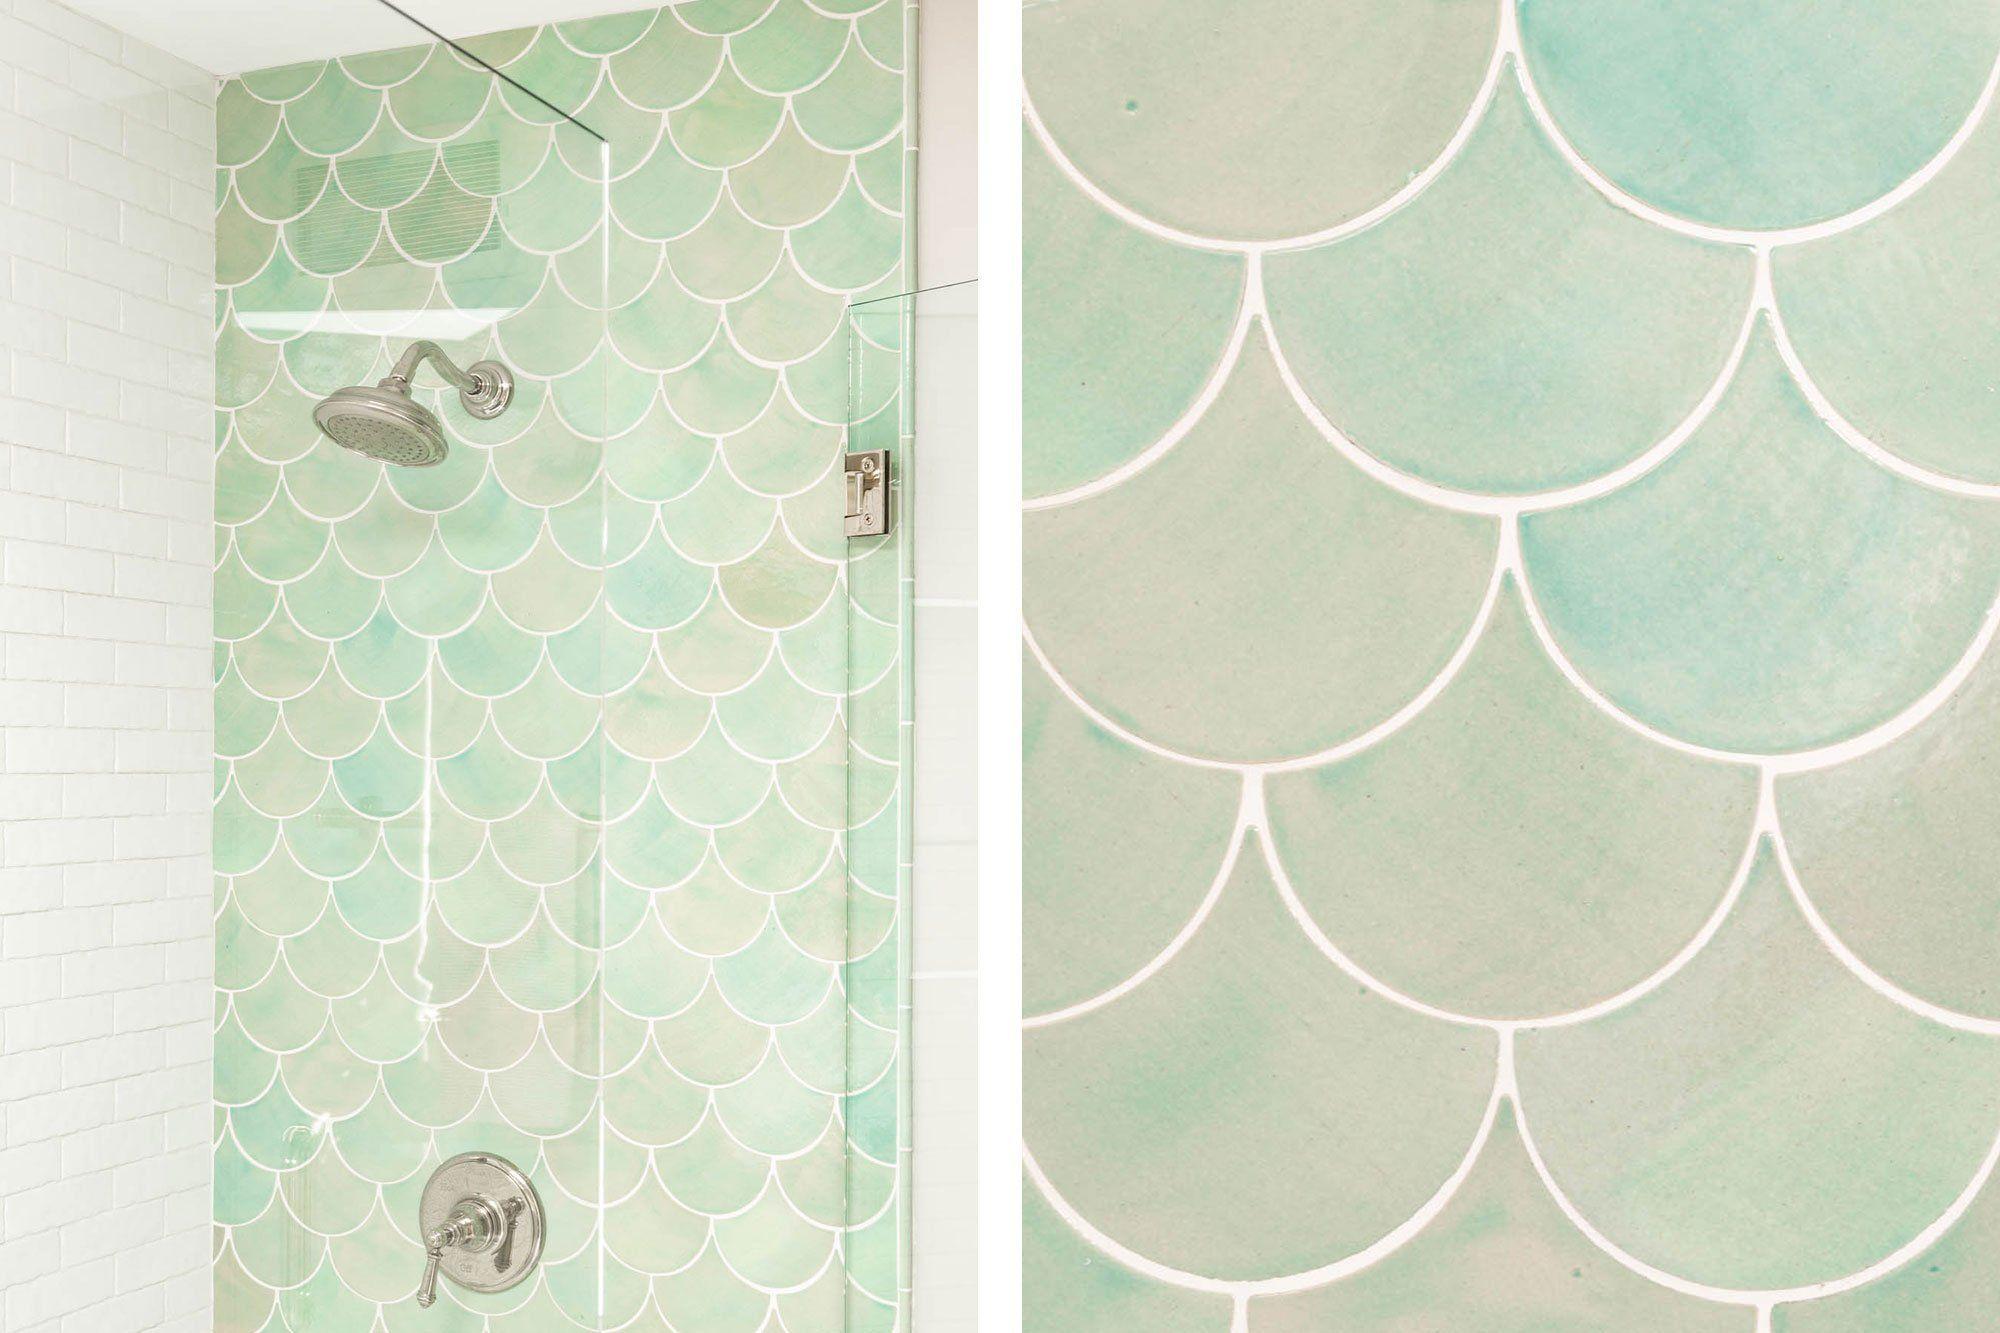 A Bathroom Oasis With Coastal Breeze Fish Scales In 2020 Bathroom Oasis Fish Tile Bathroom Scallop Tile Bathroom